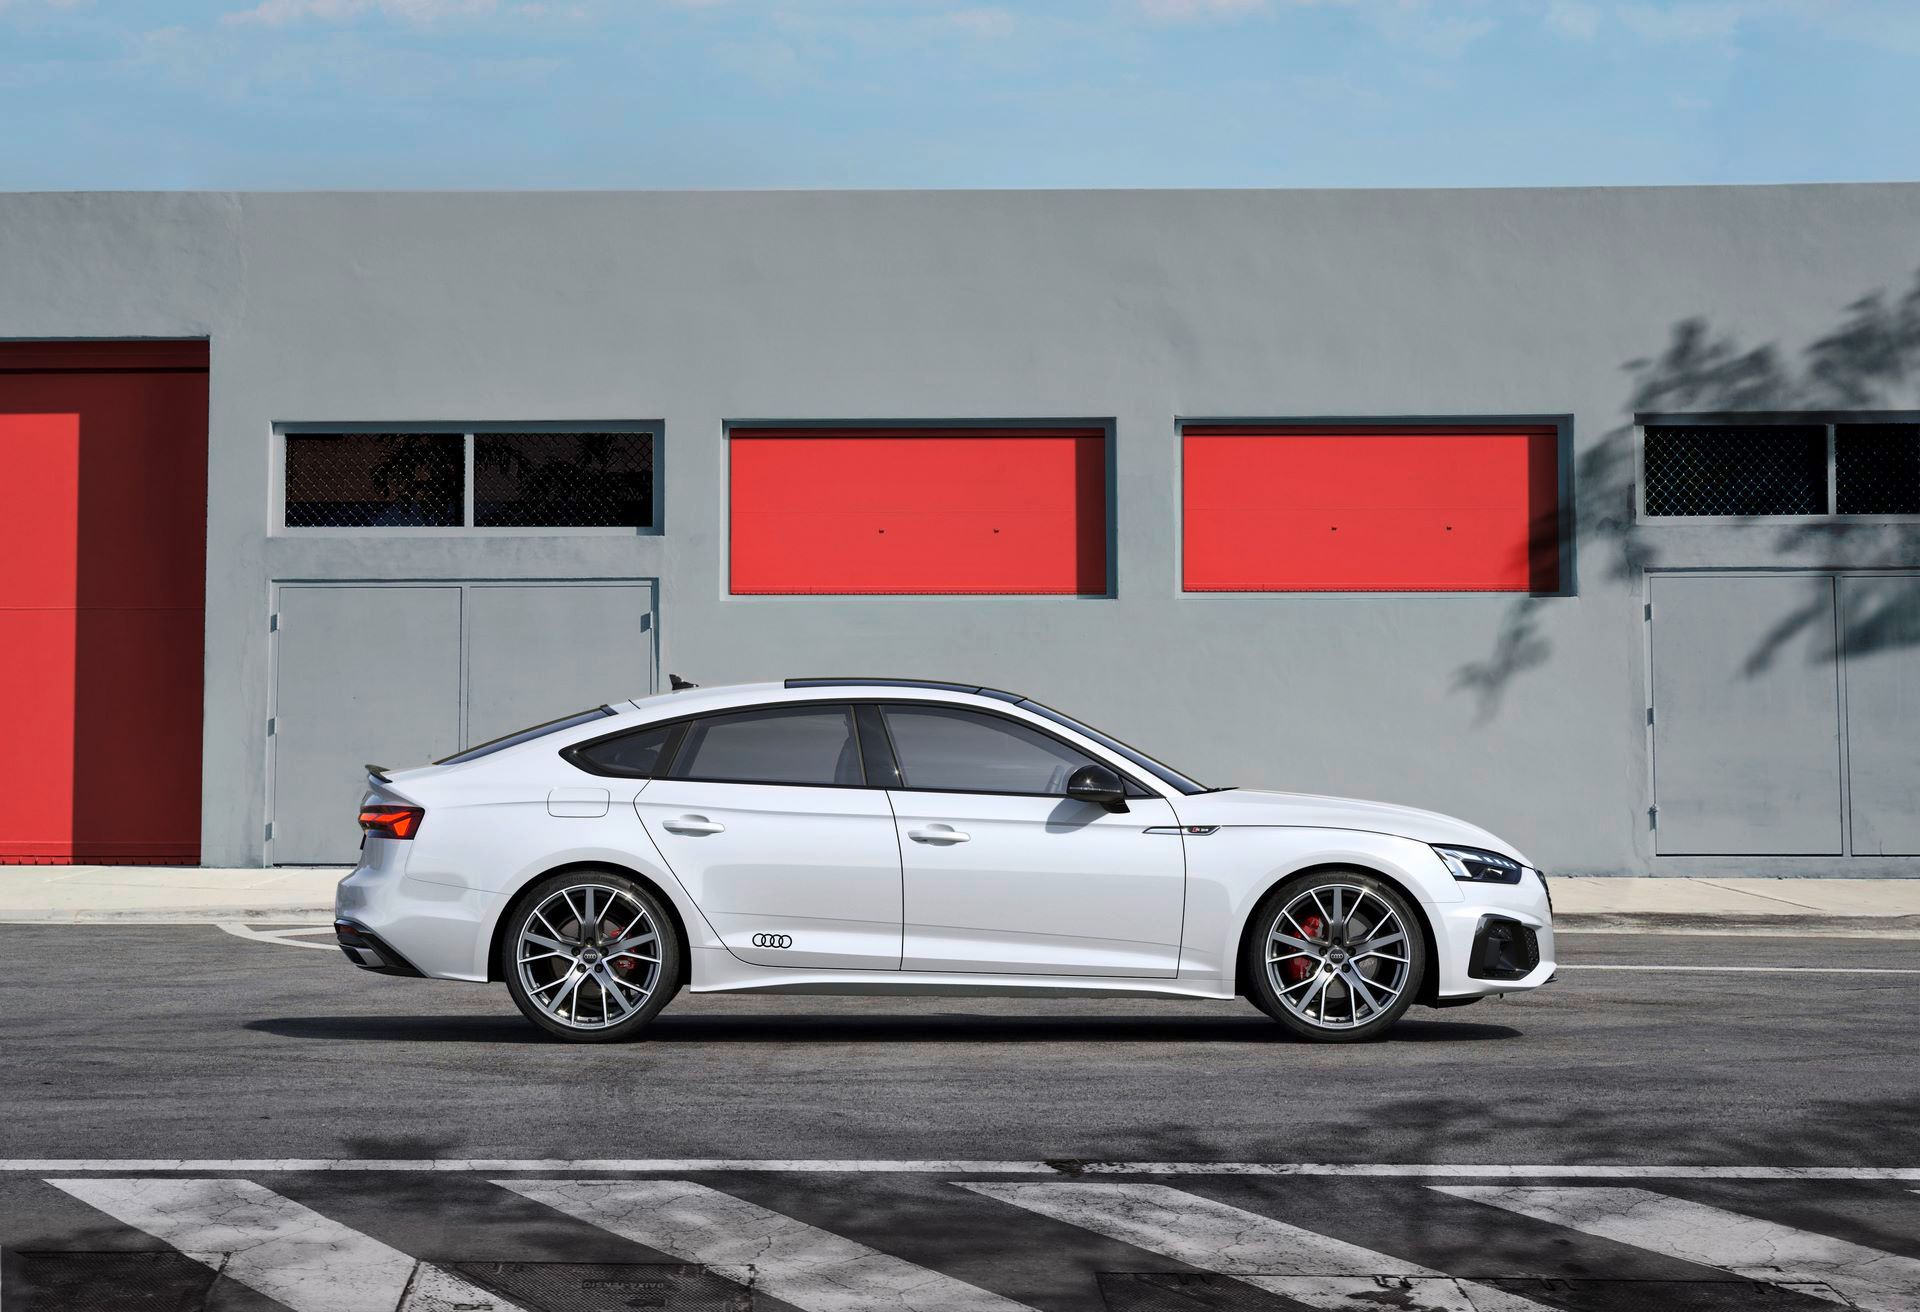 Audi-A4-A5-Q7-Q8-Competition-And-Competition-Plus-Trims-62